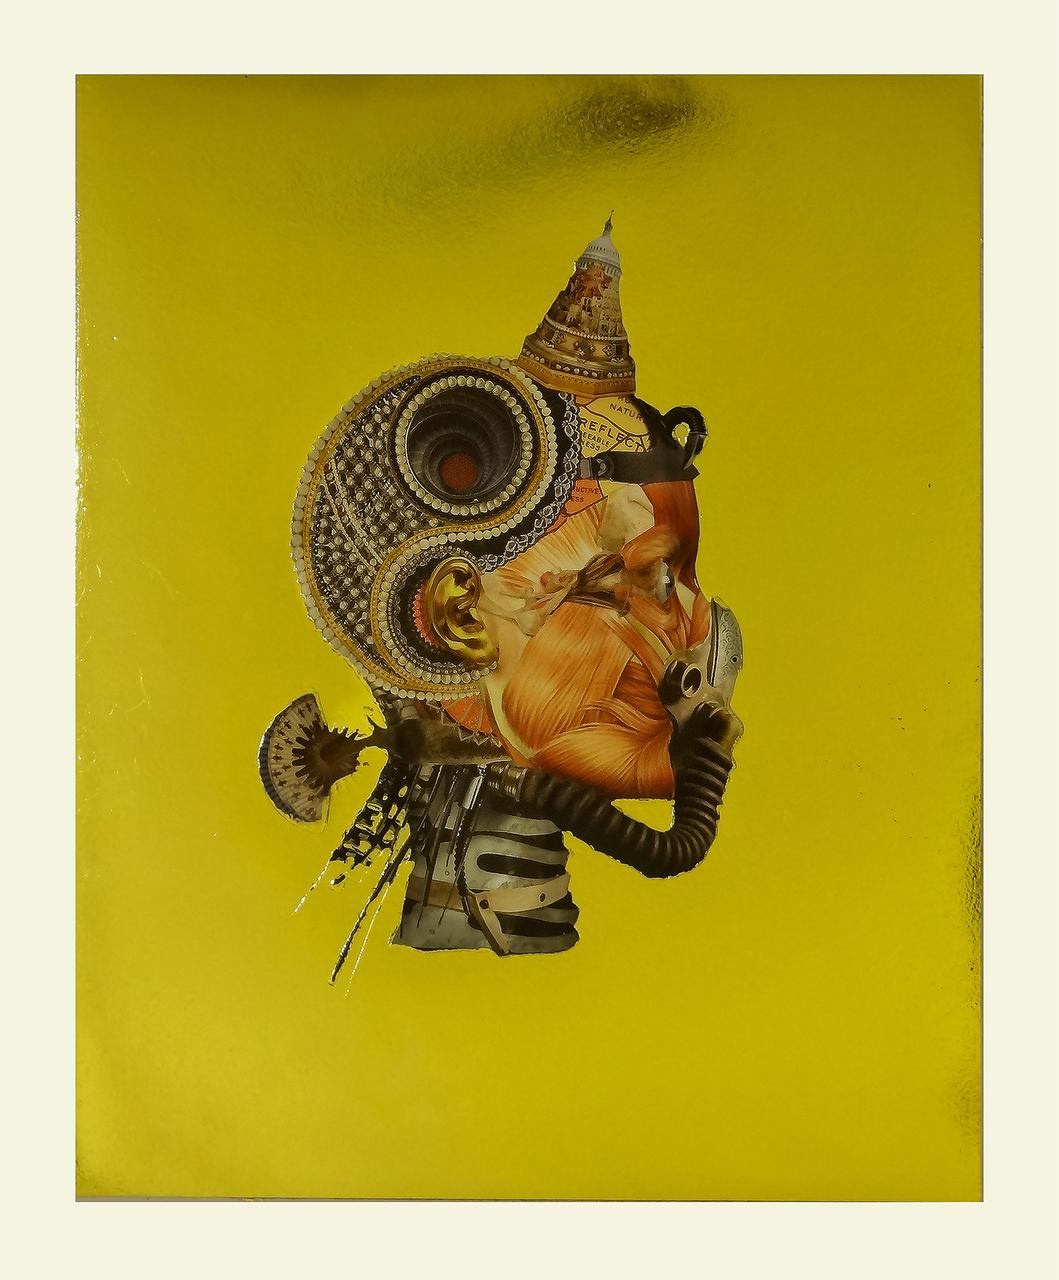 The Dukes of Urbino, digital print on Hahnemühle archival paper, 50 x 60 cm (each), 2014